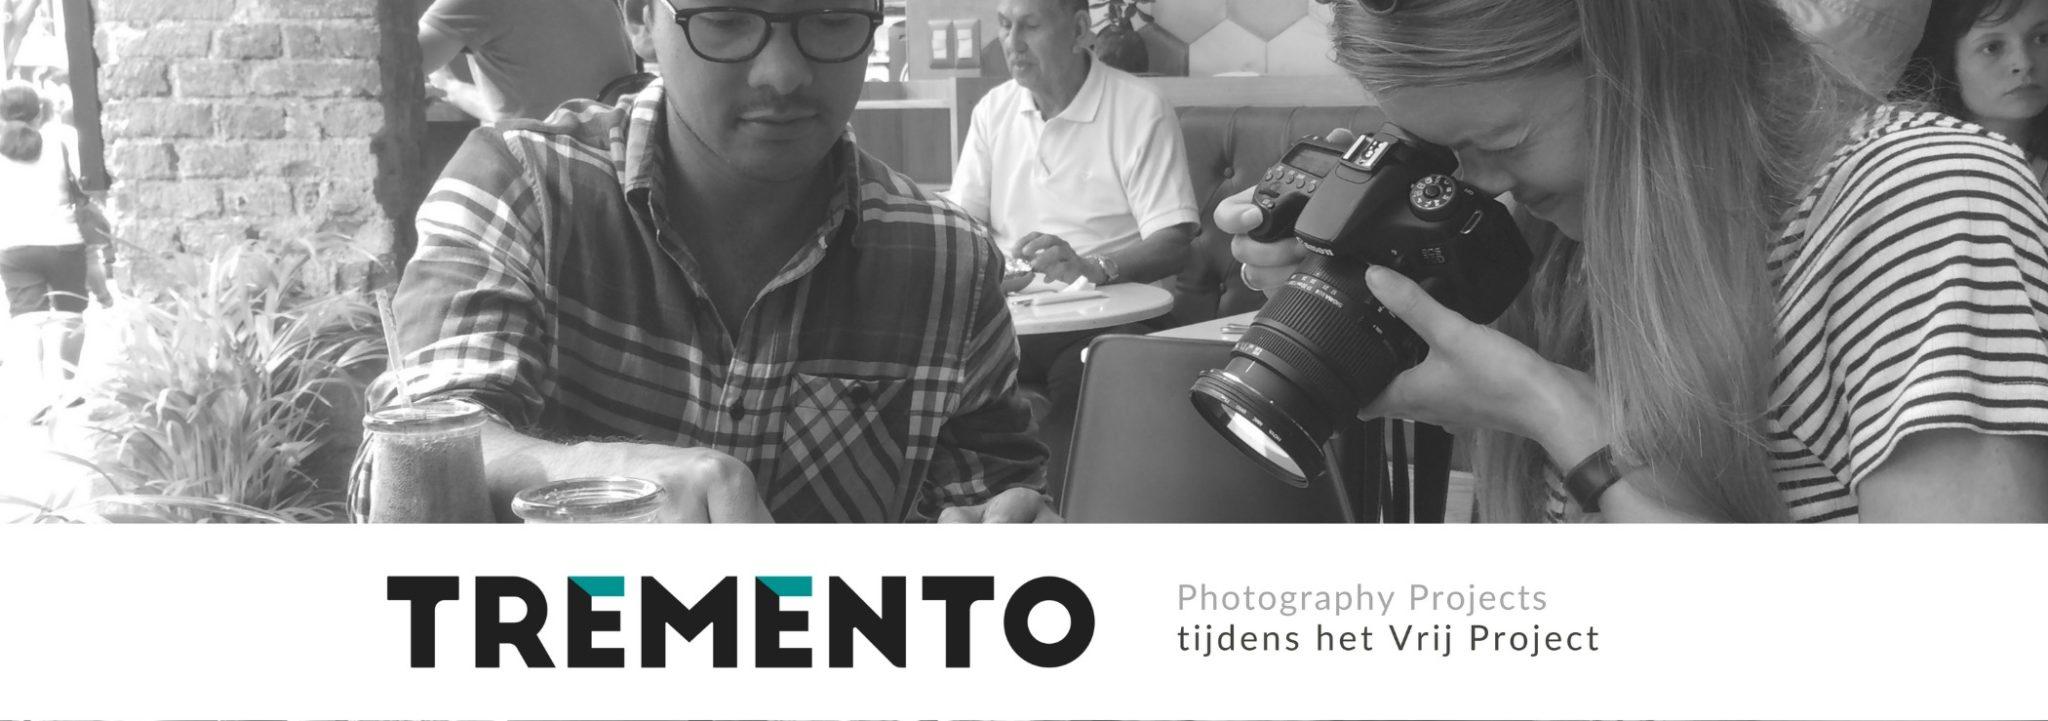 Tremento Portfolio Photography